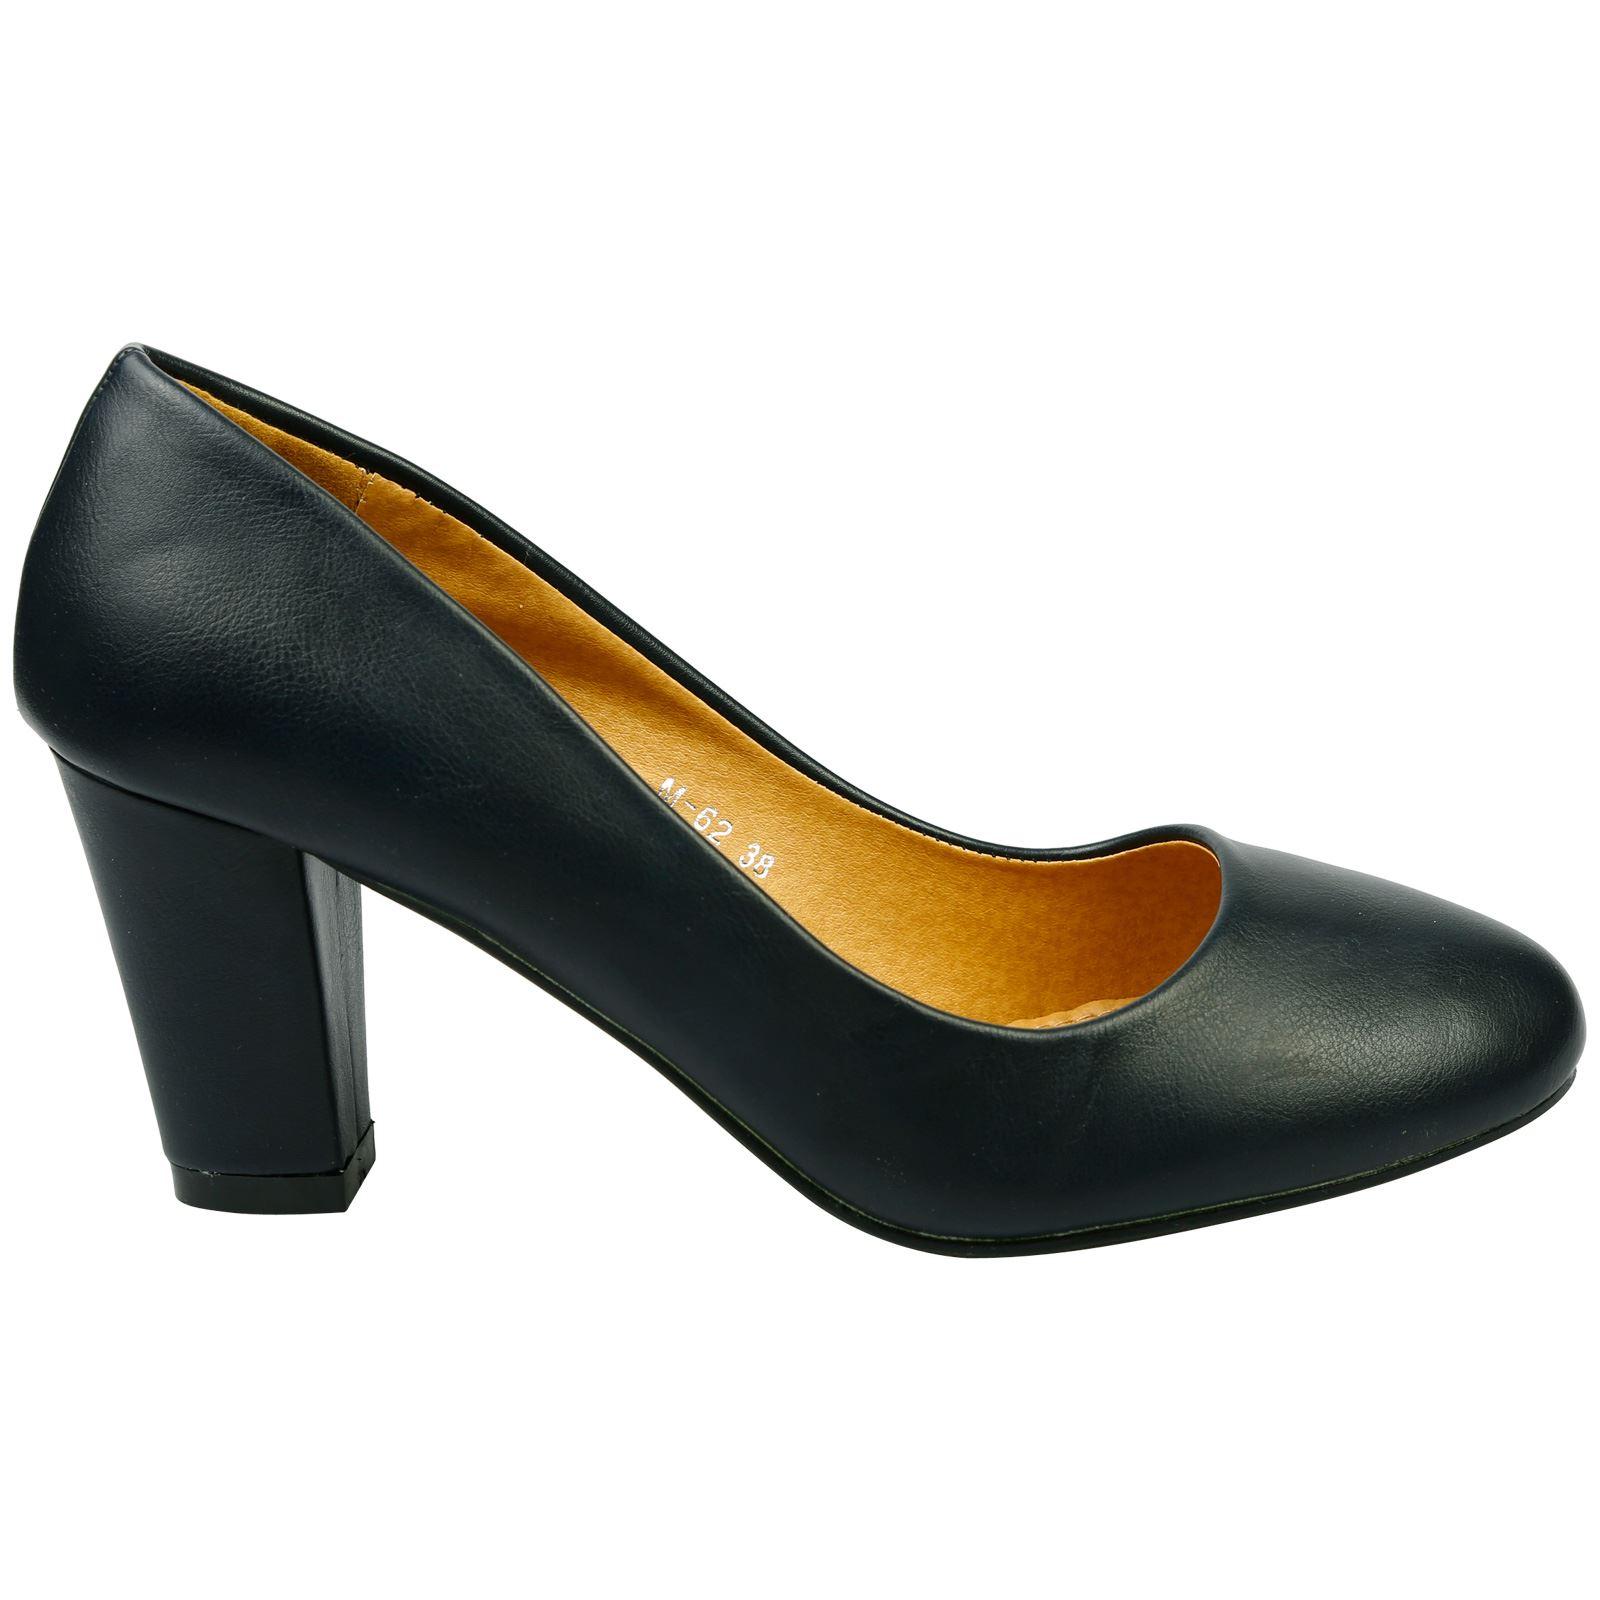 b1563e5e62 Reeva Womens Mid High Block Heels Slip On Court Shoes Ladies Pumps ...